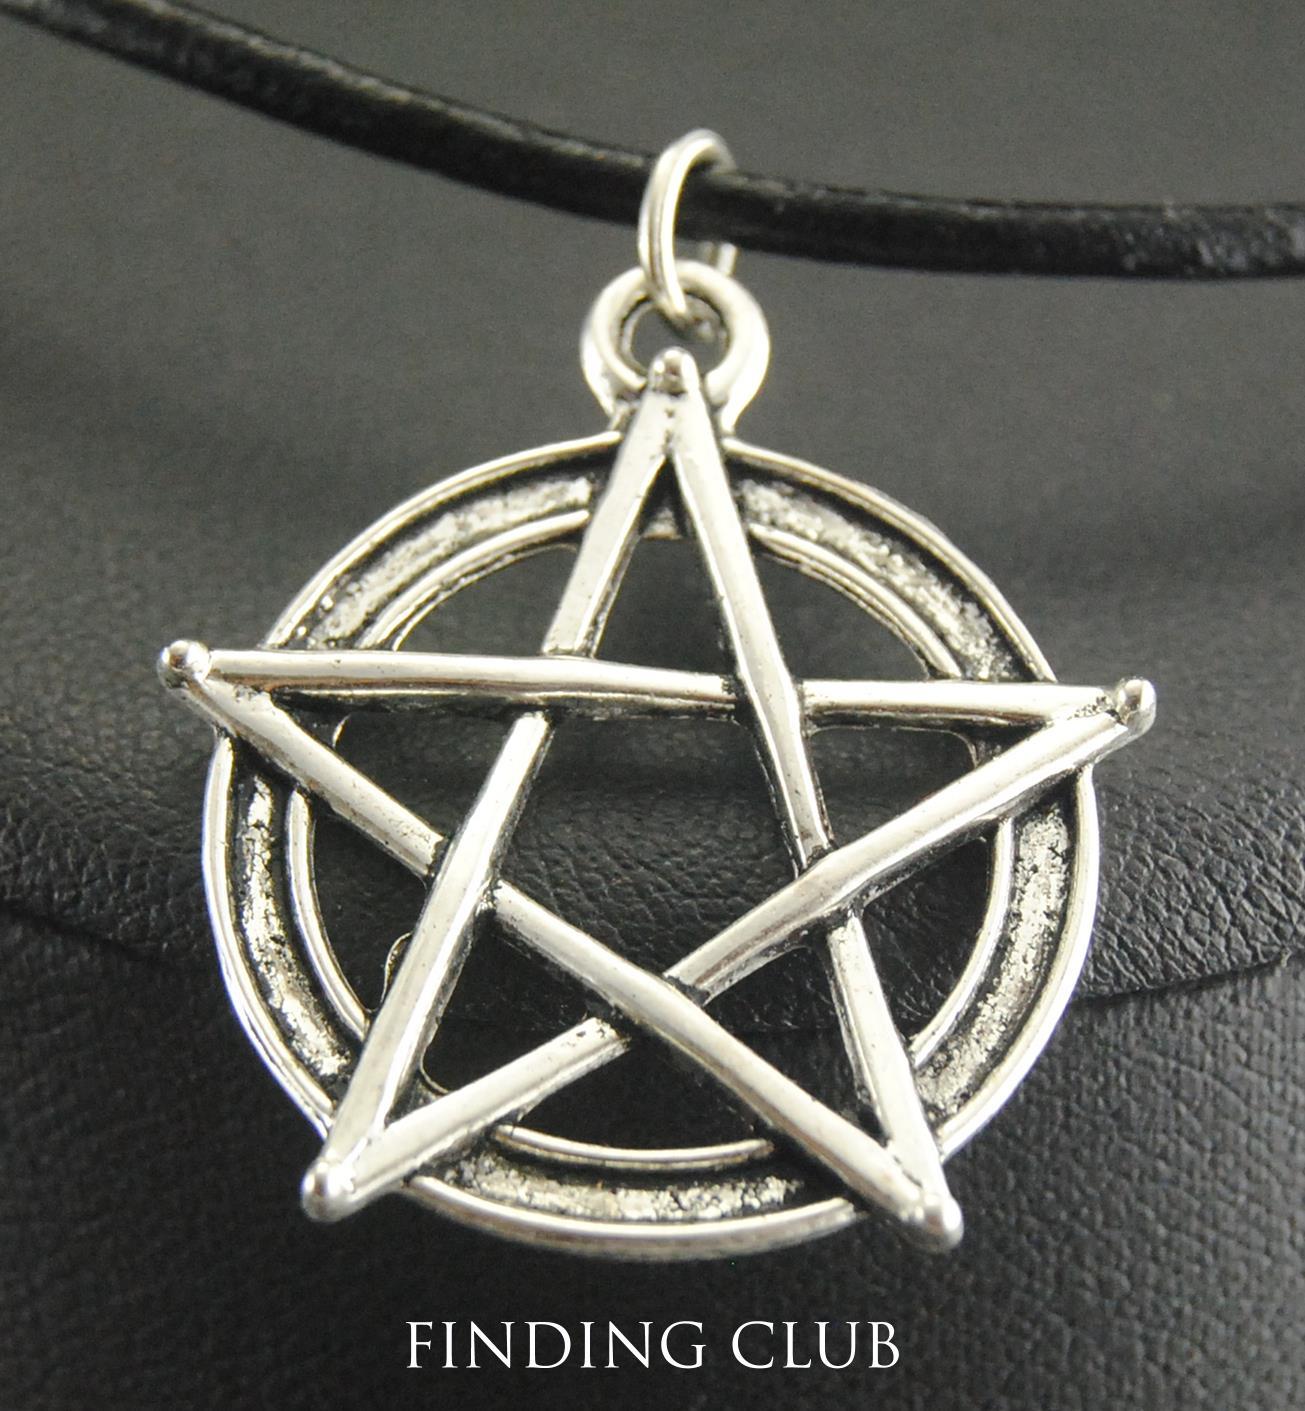 94ecf6608b26 Estrella de Plata tibetana Wicca Pentáculo Colgante Cordón de cuero negro  Collar gargantilla Collar joyería